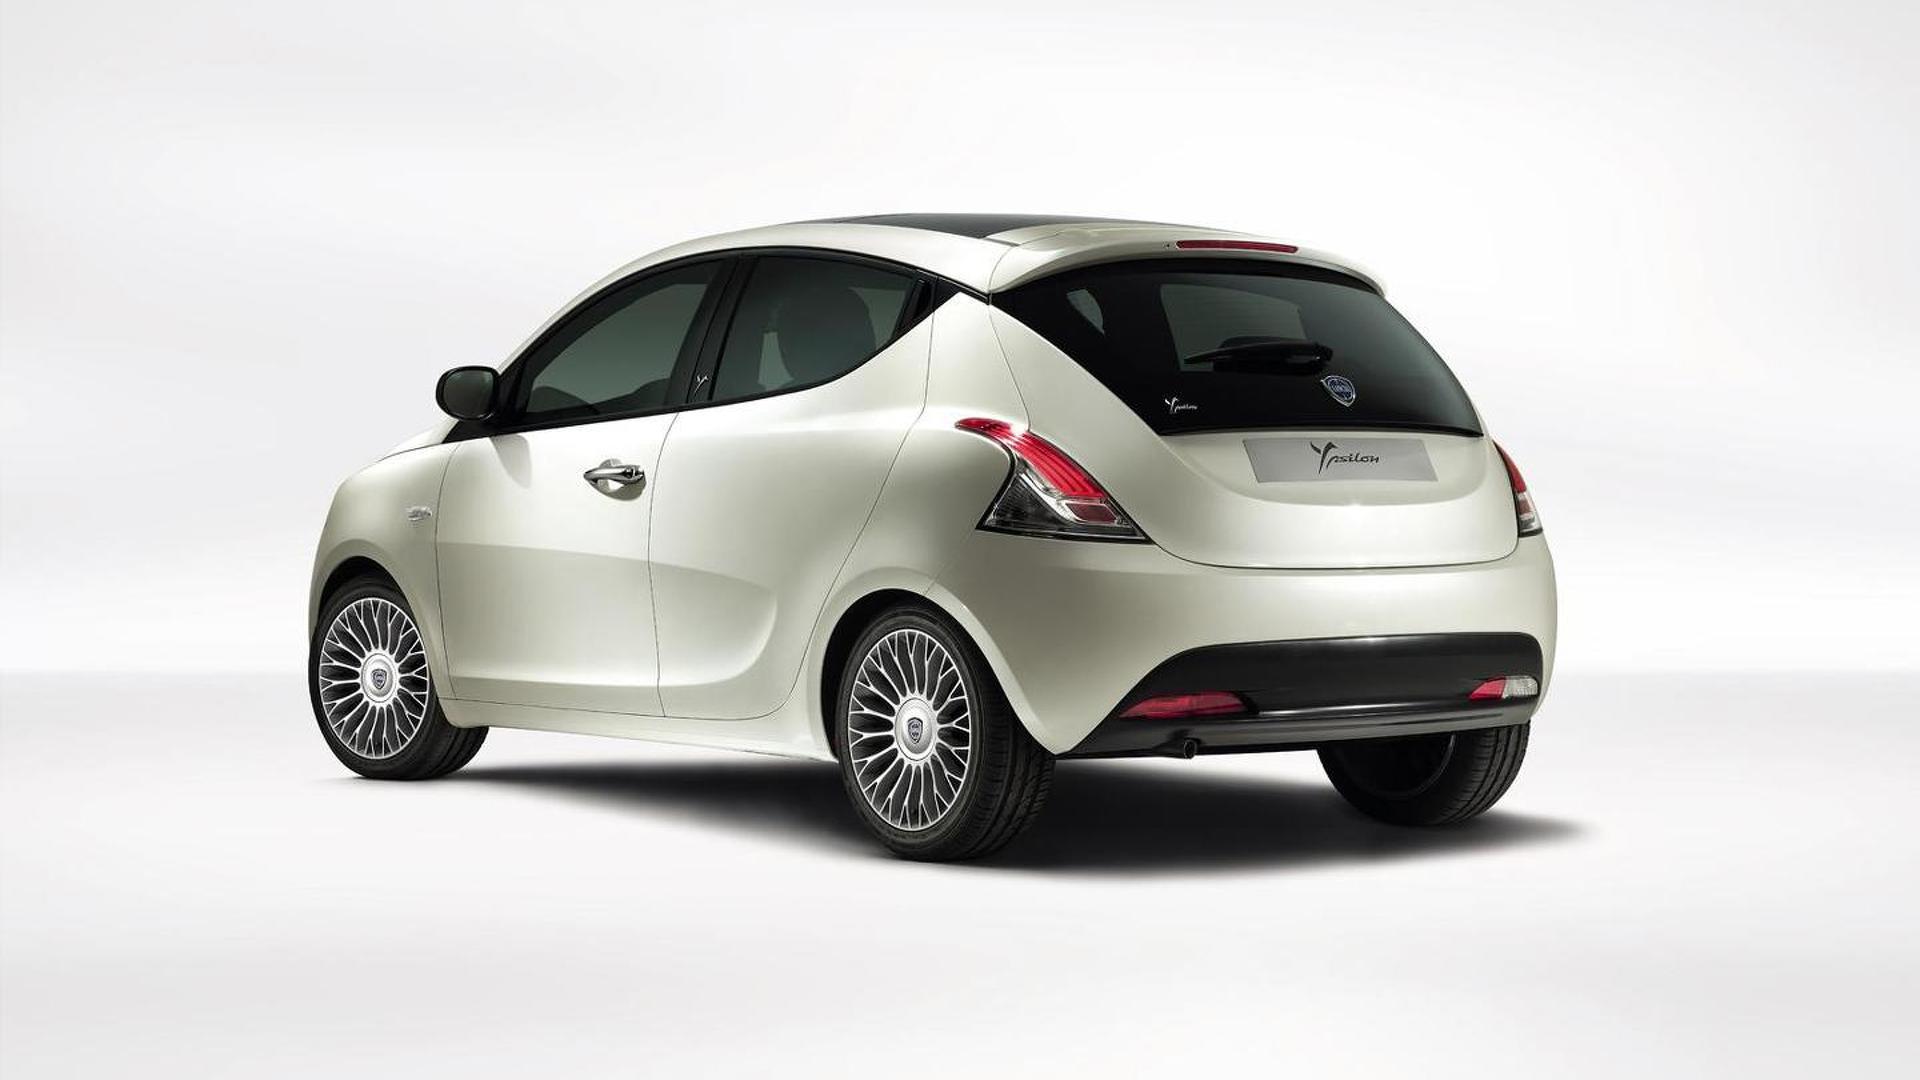 Entry-level Chrysler models axed - report